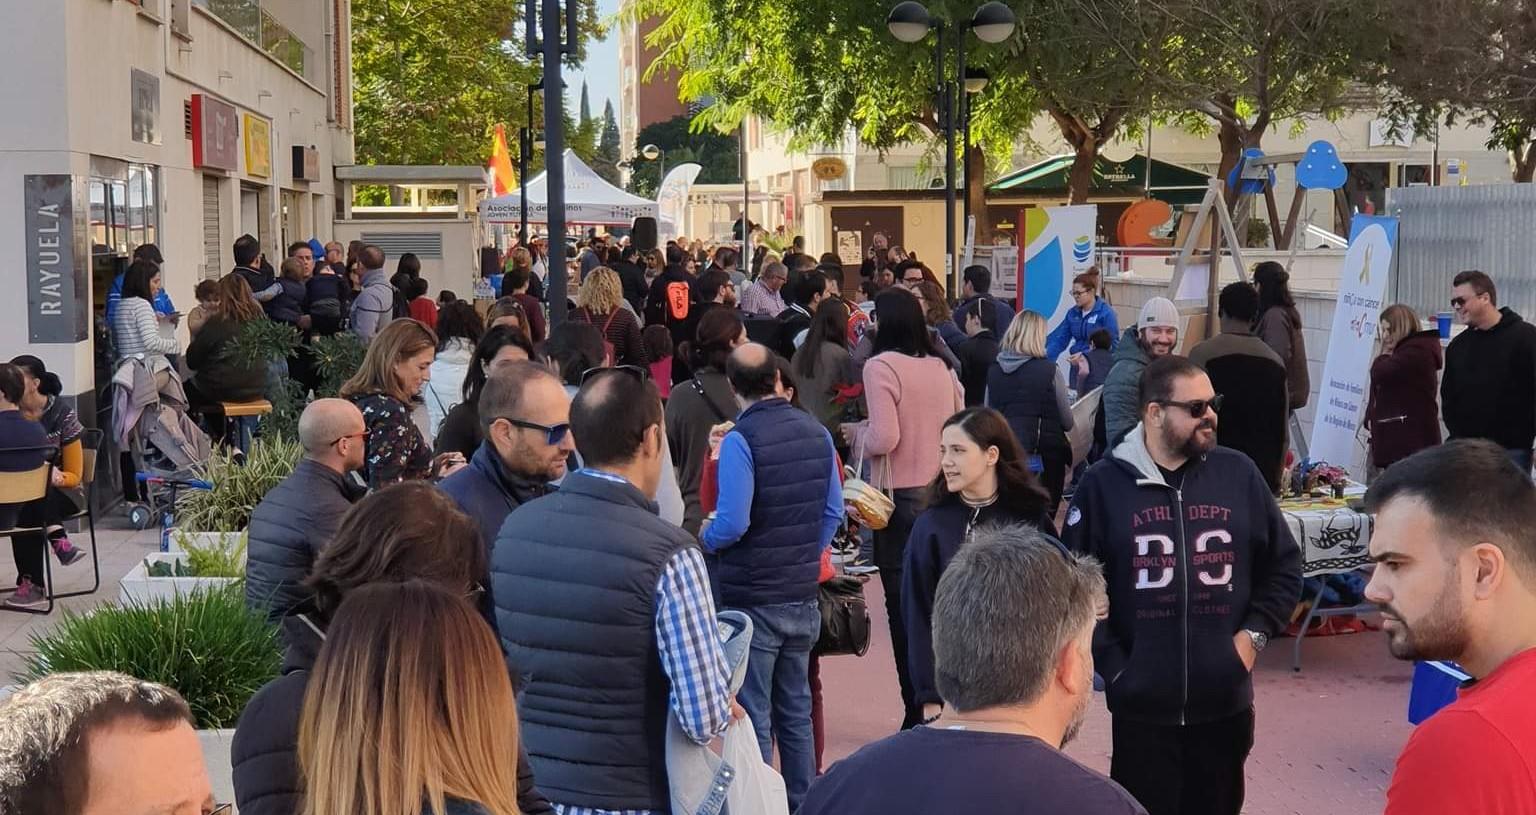 Jornada Solidaria 2019 Joven Futura, Espinardo, Murcia.